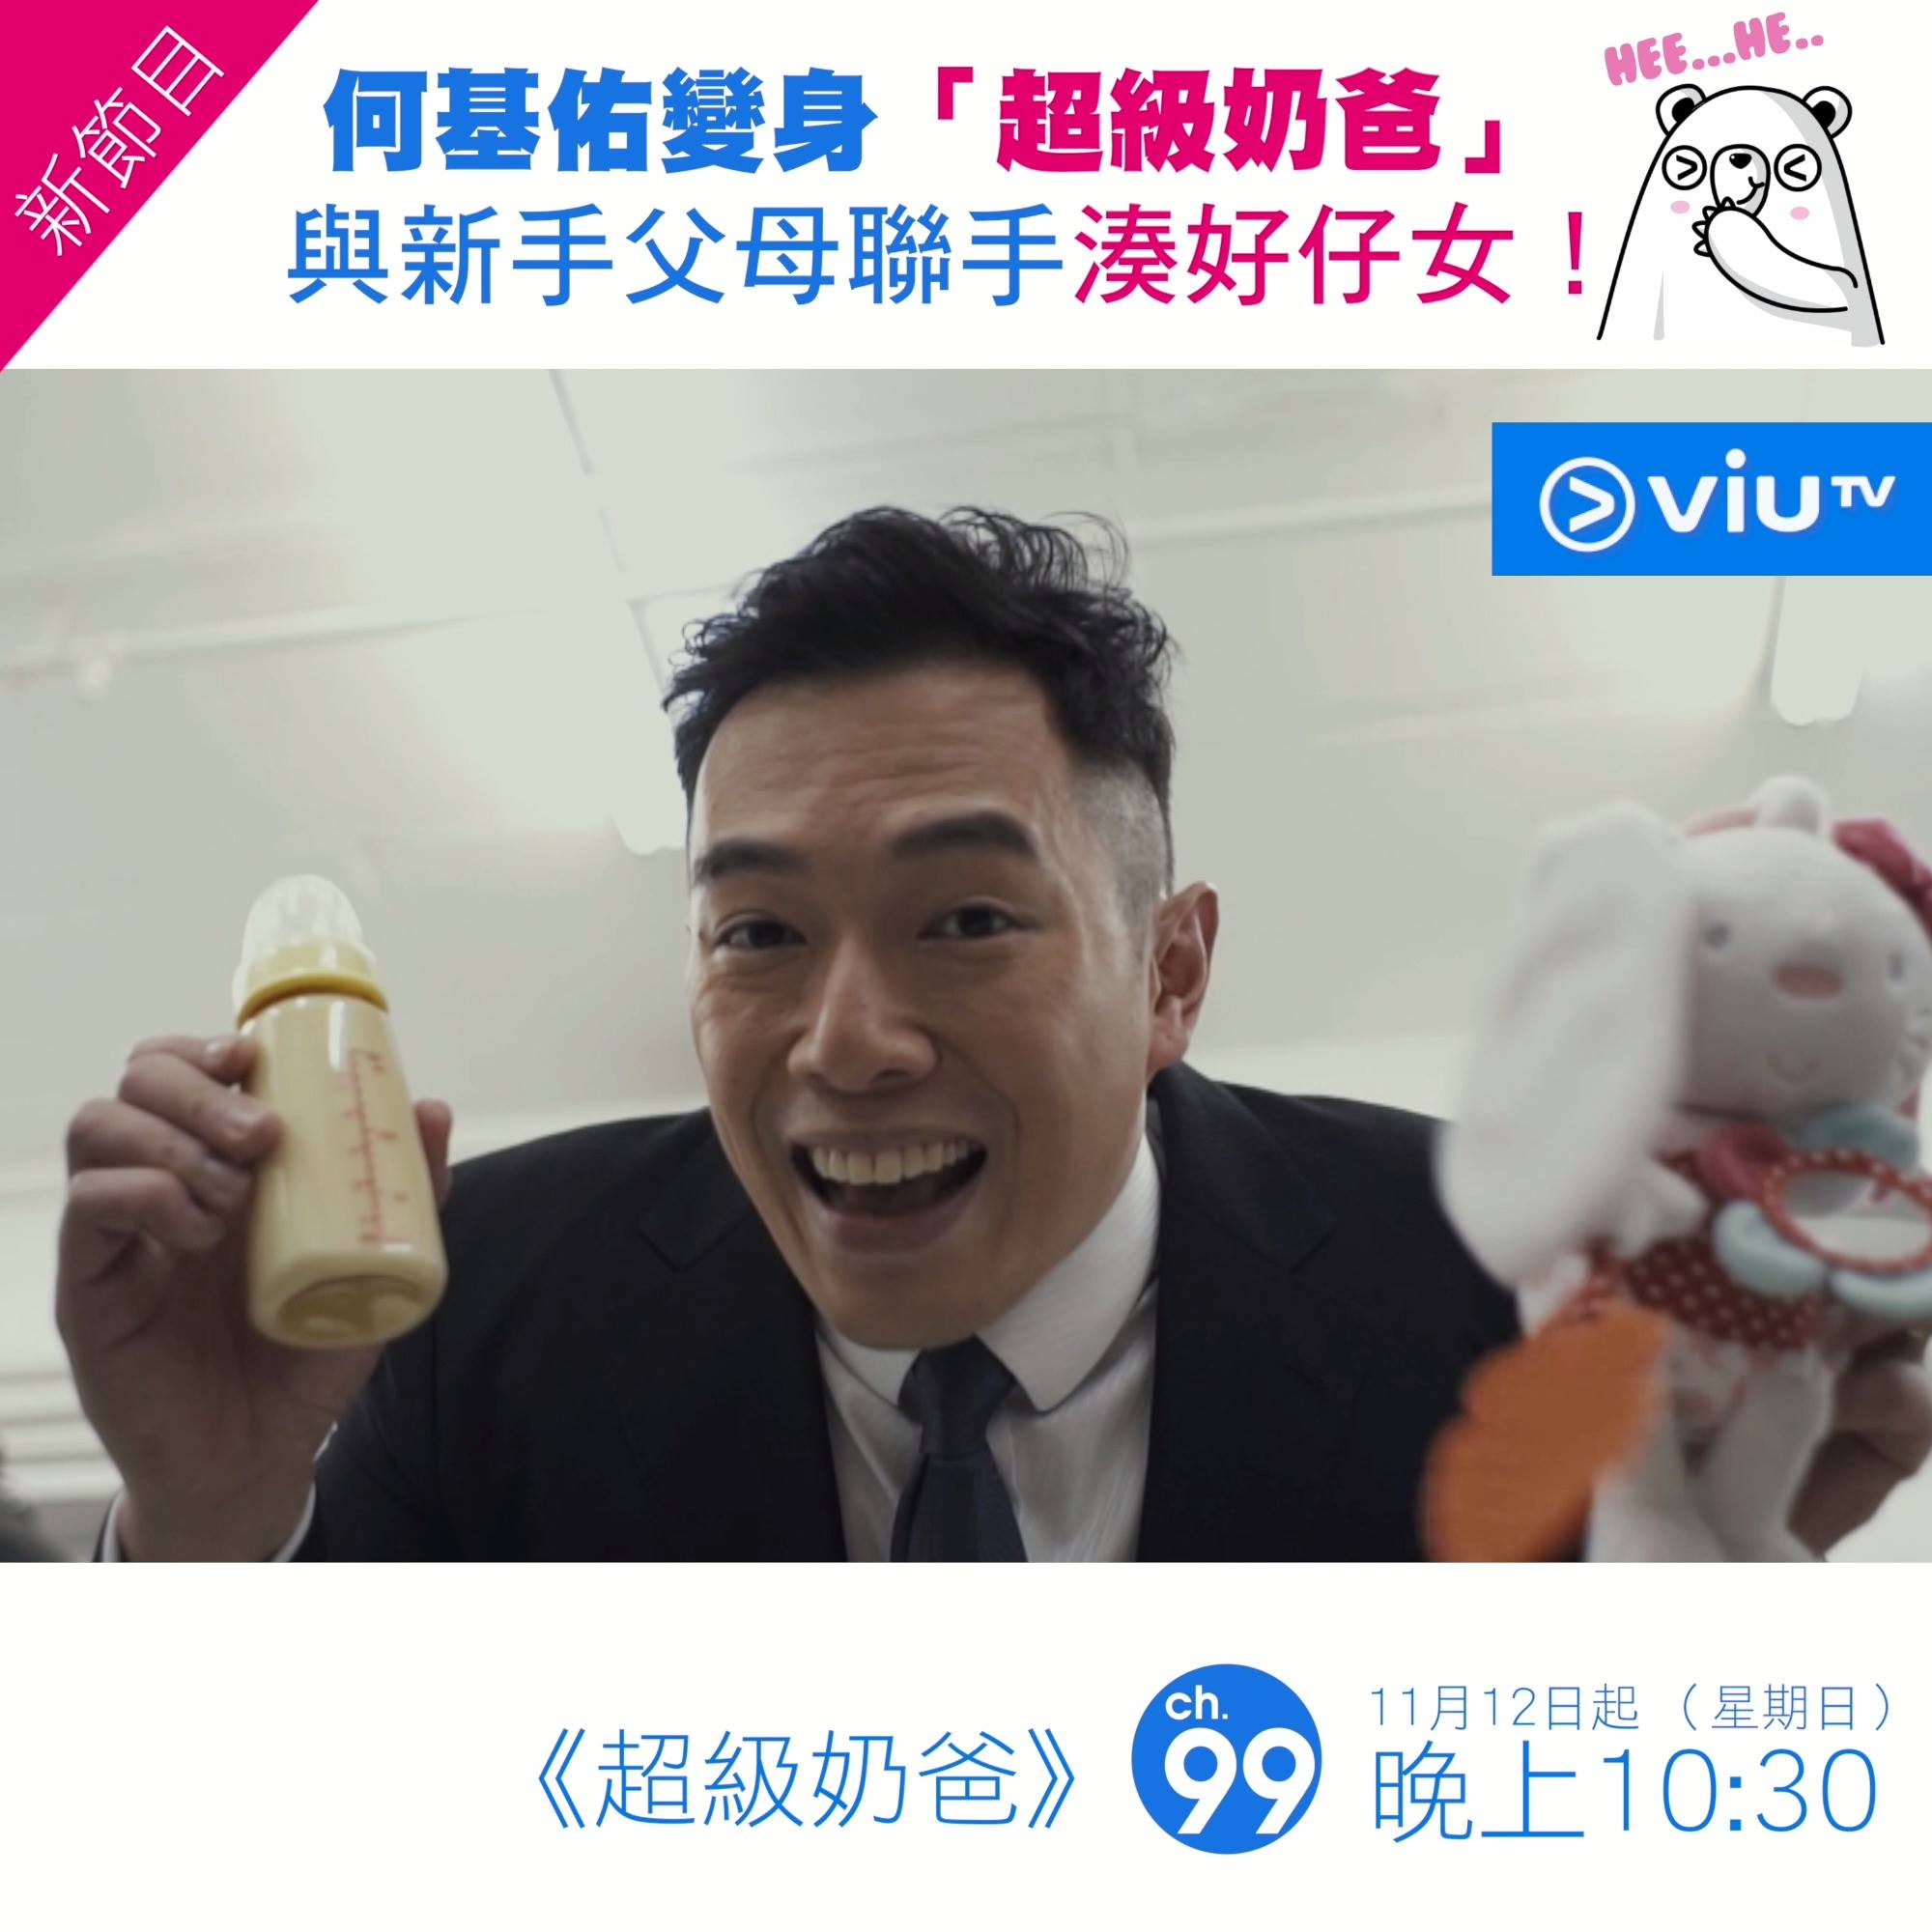 ViuTV節目 - 《超級奶爸》